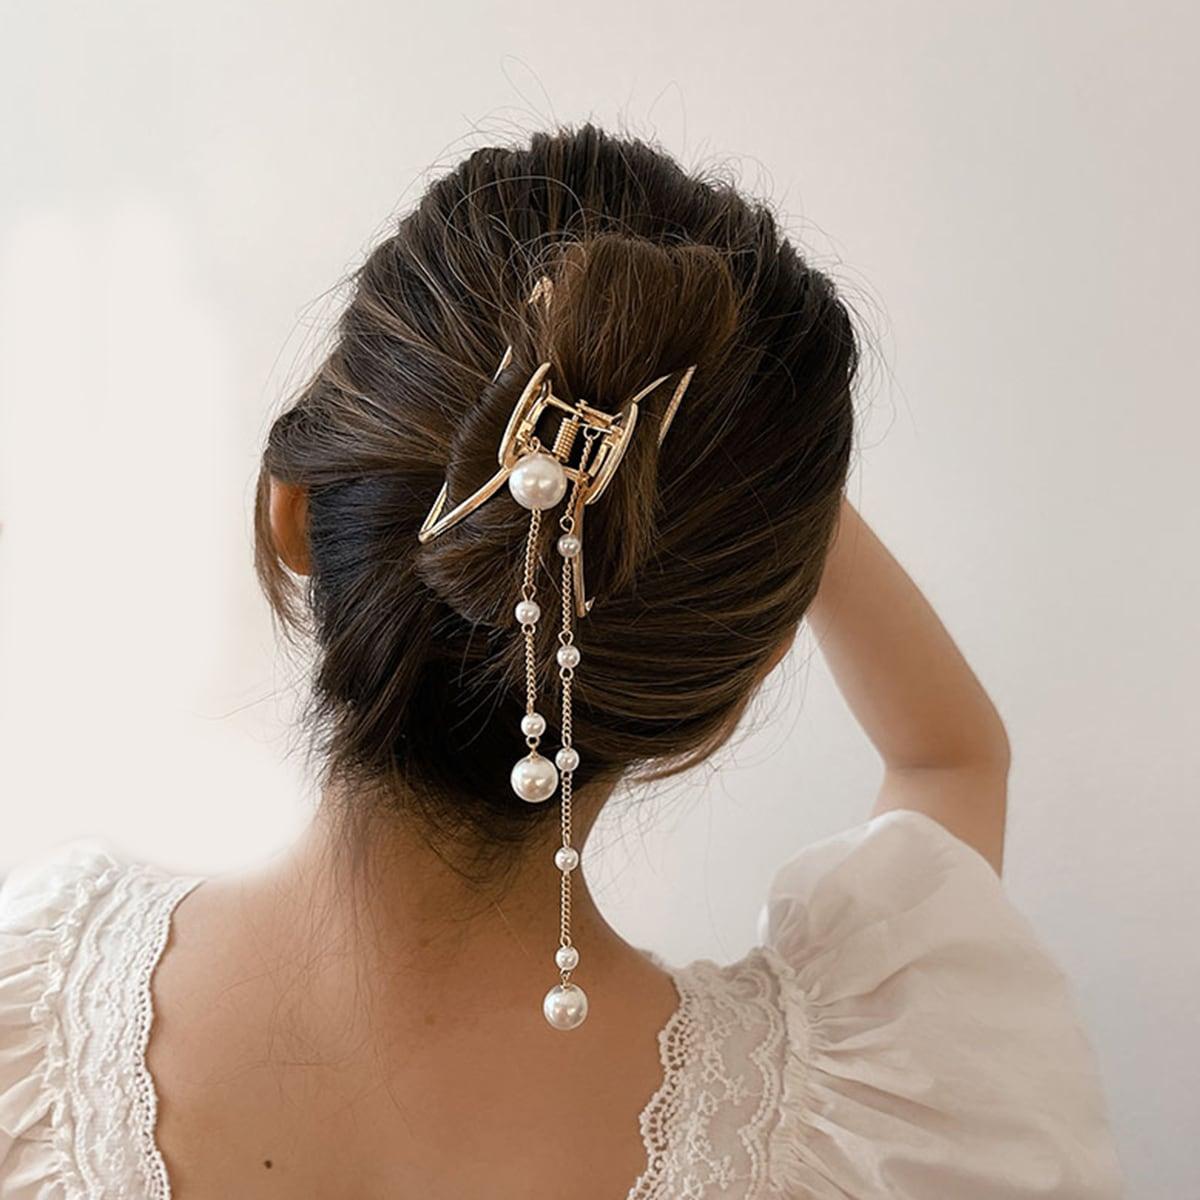 Faux Pearl Pendant Hair Claw